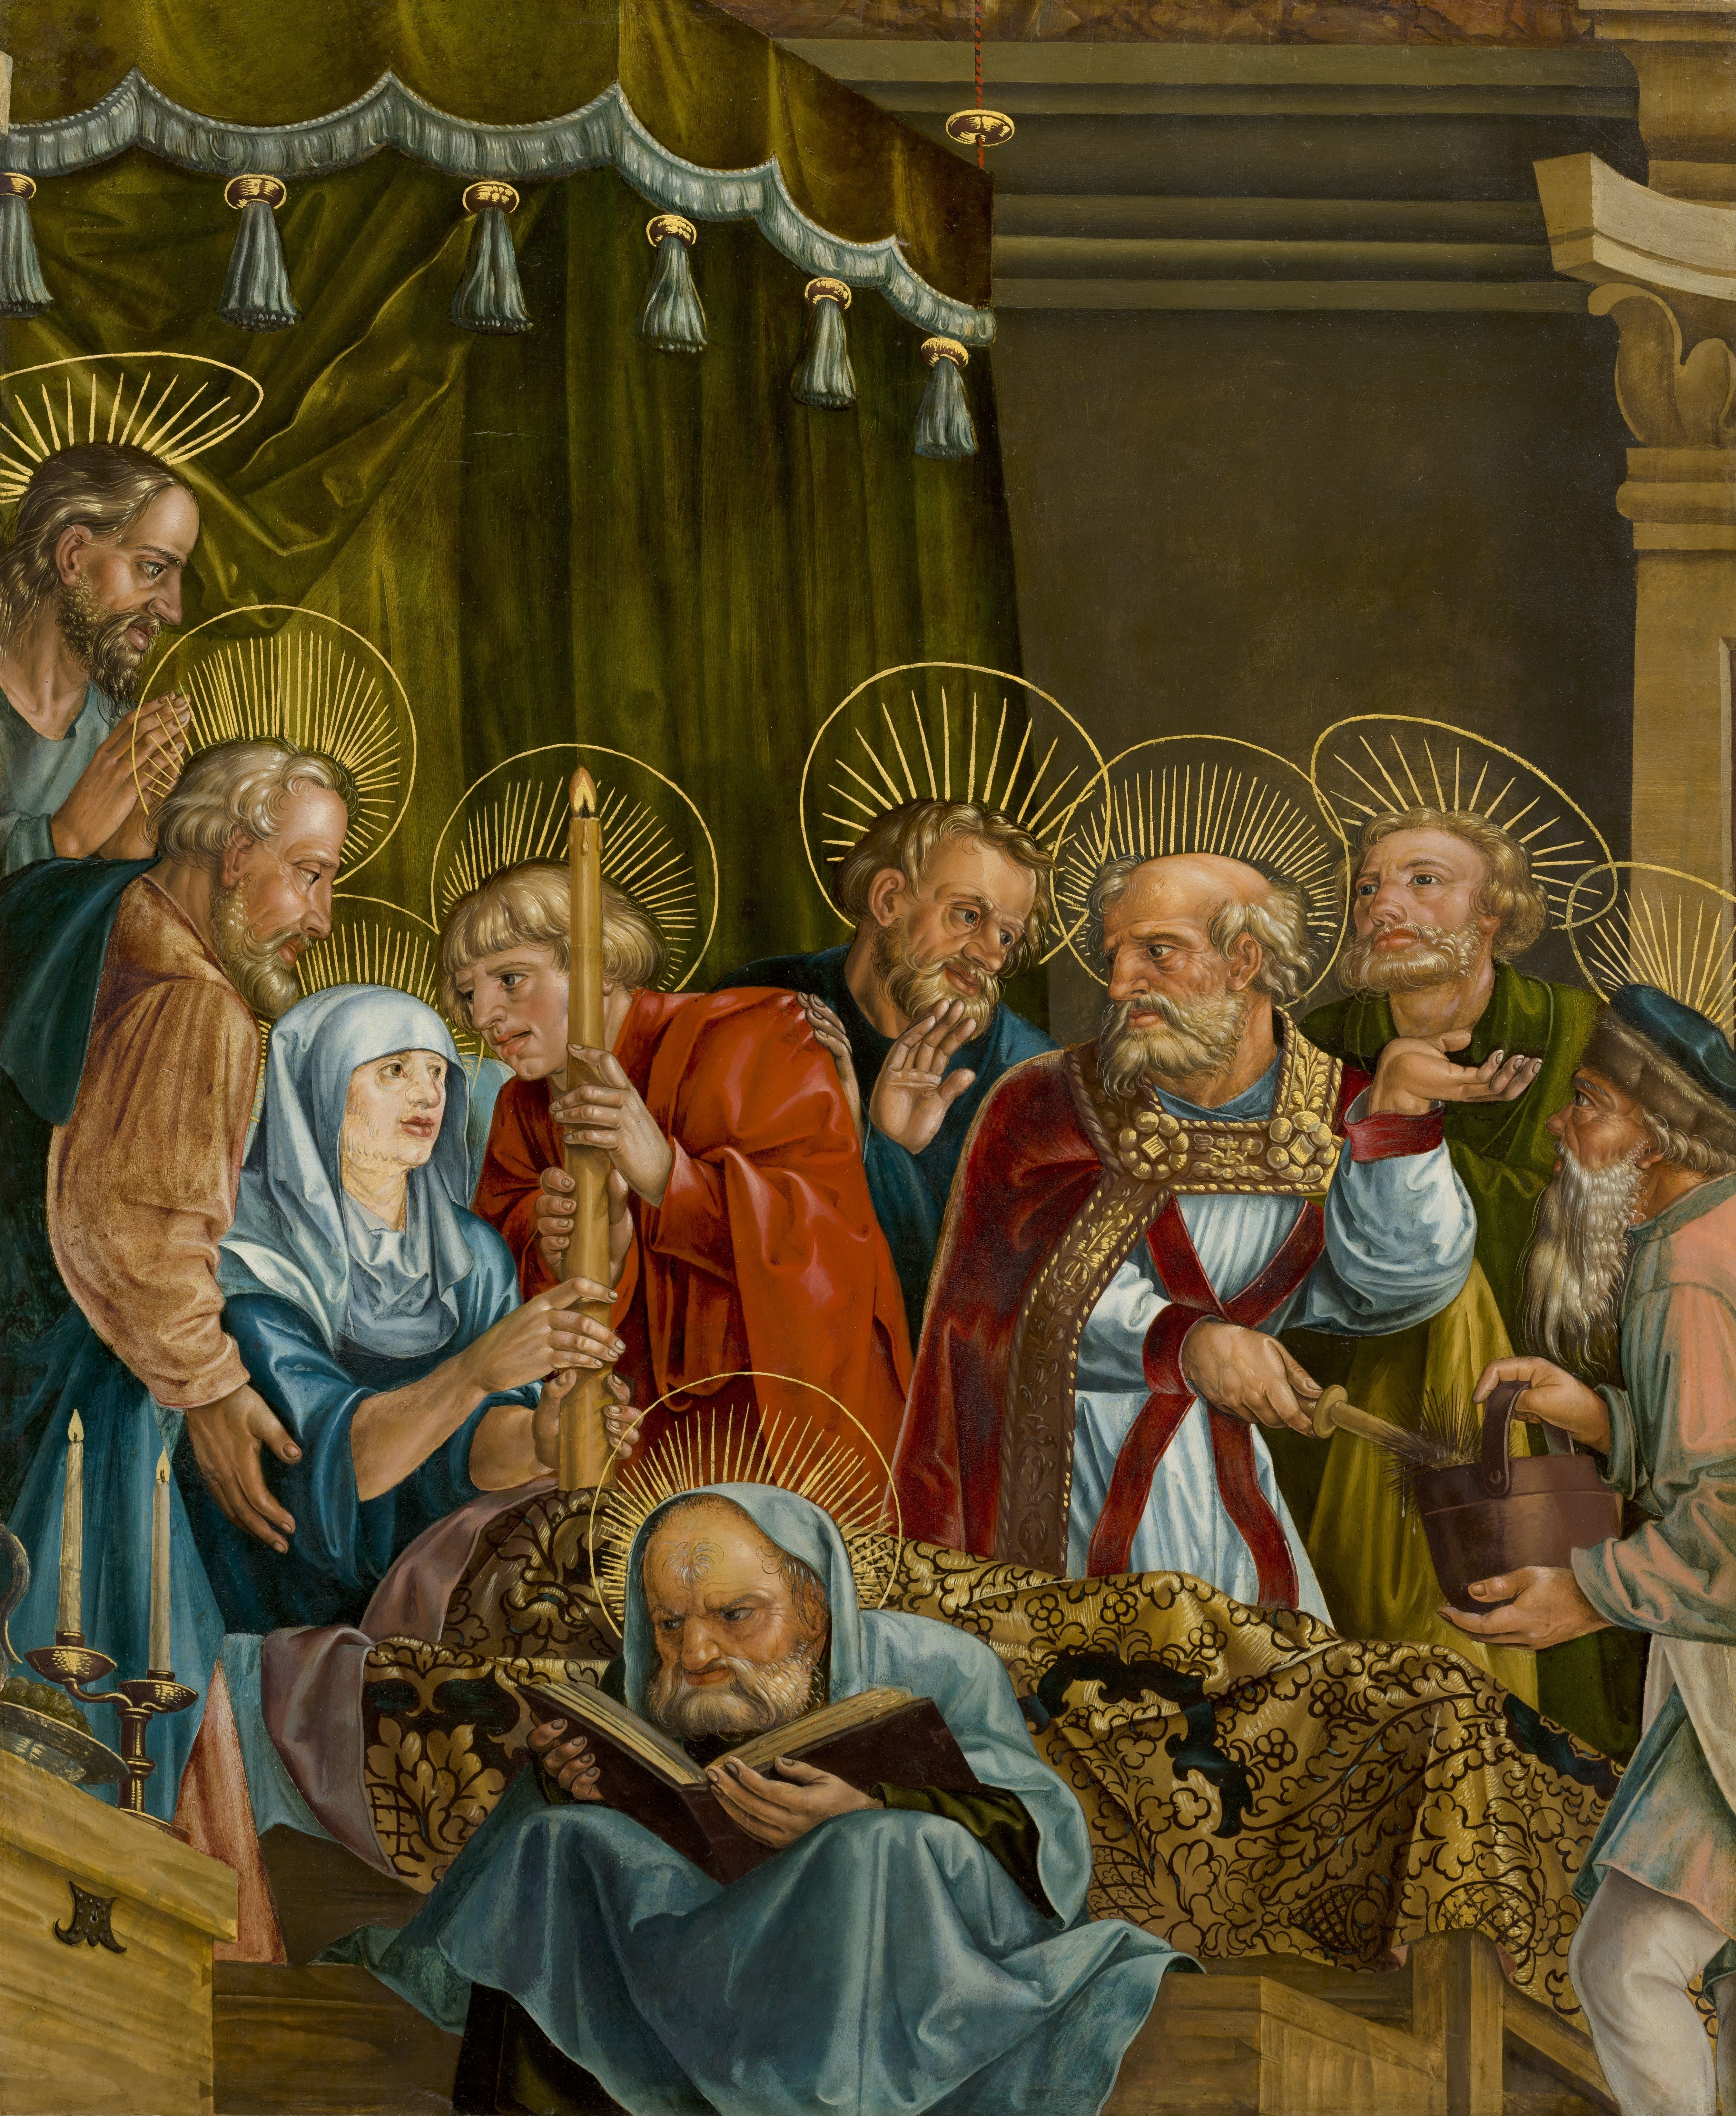 File:Melchior Feselen - Marientod (1531).jpg - Wikimedia Commons